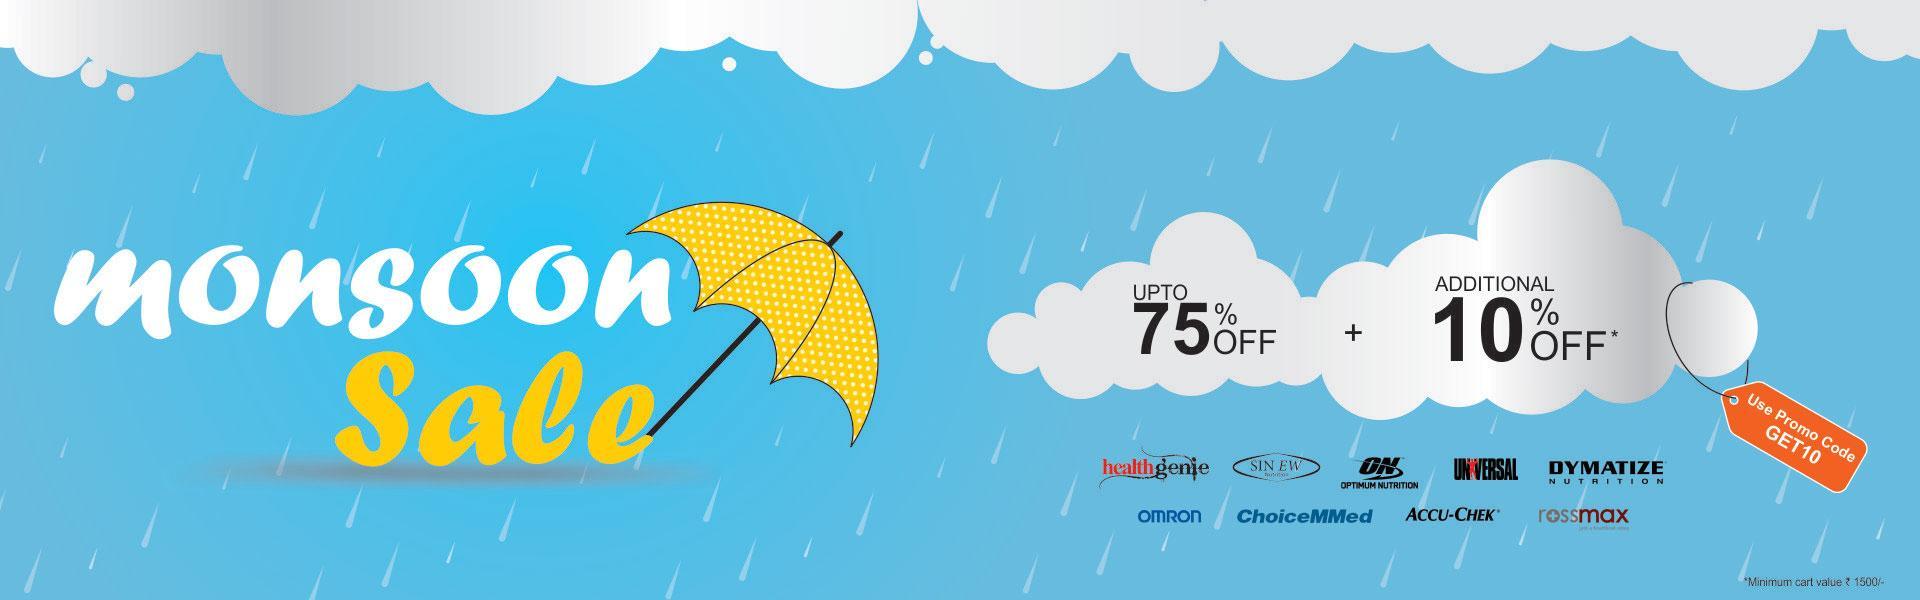 Healthgenie Monsoon Offer